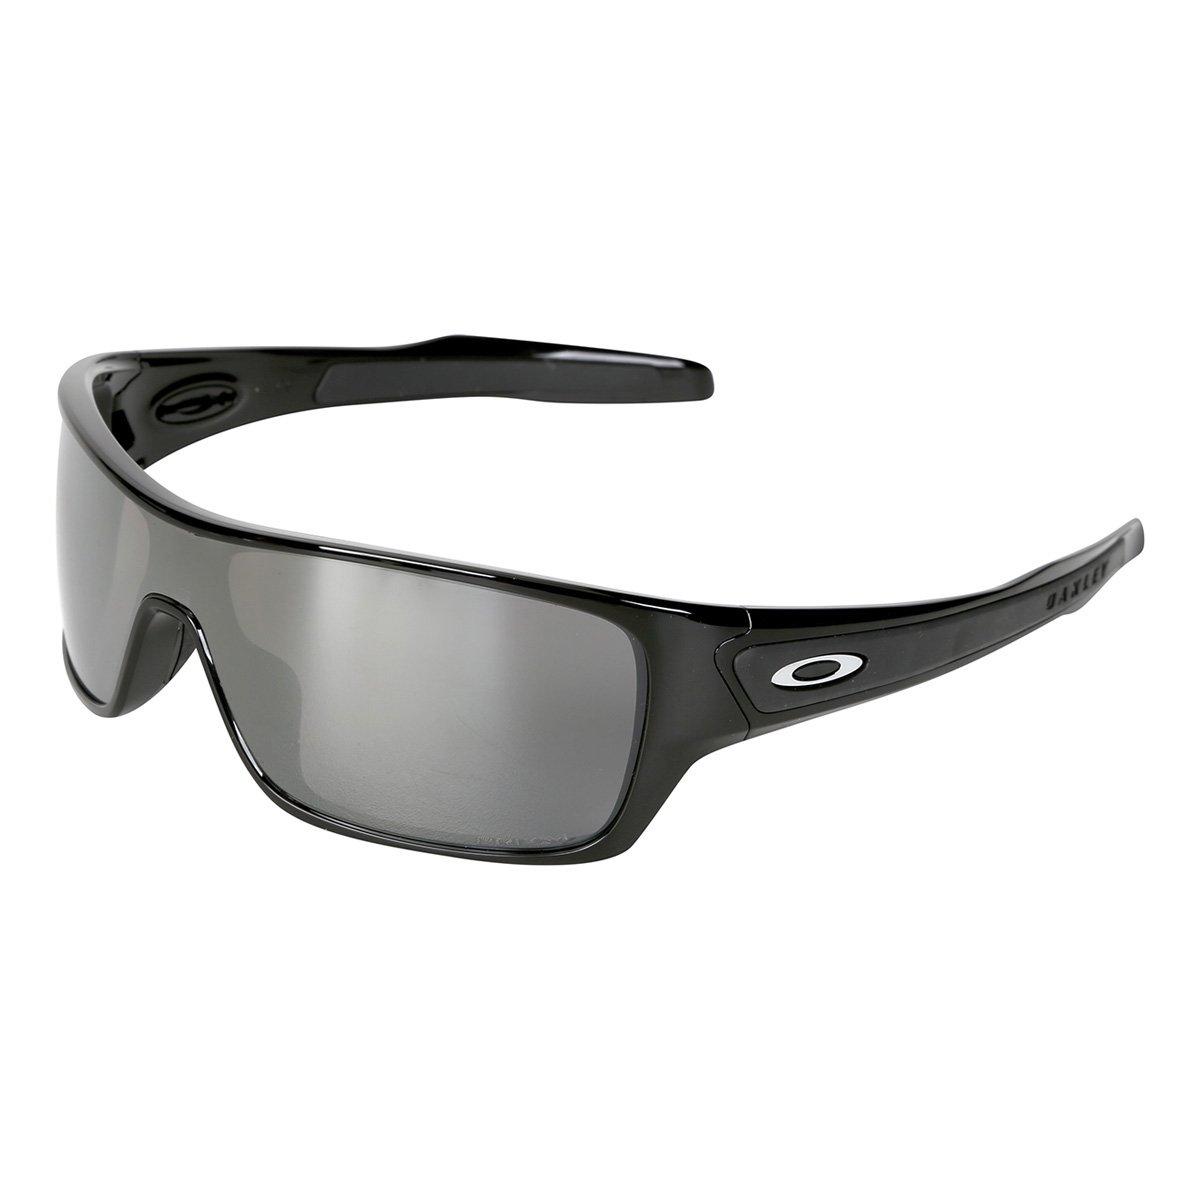 1595b2fe6f253 Óculos de Sol Oakley Turbine Rotor Masculino